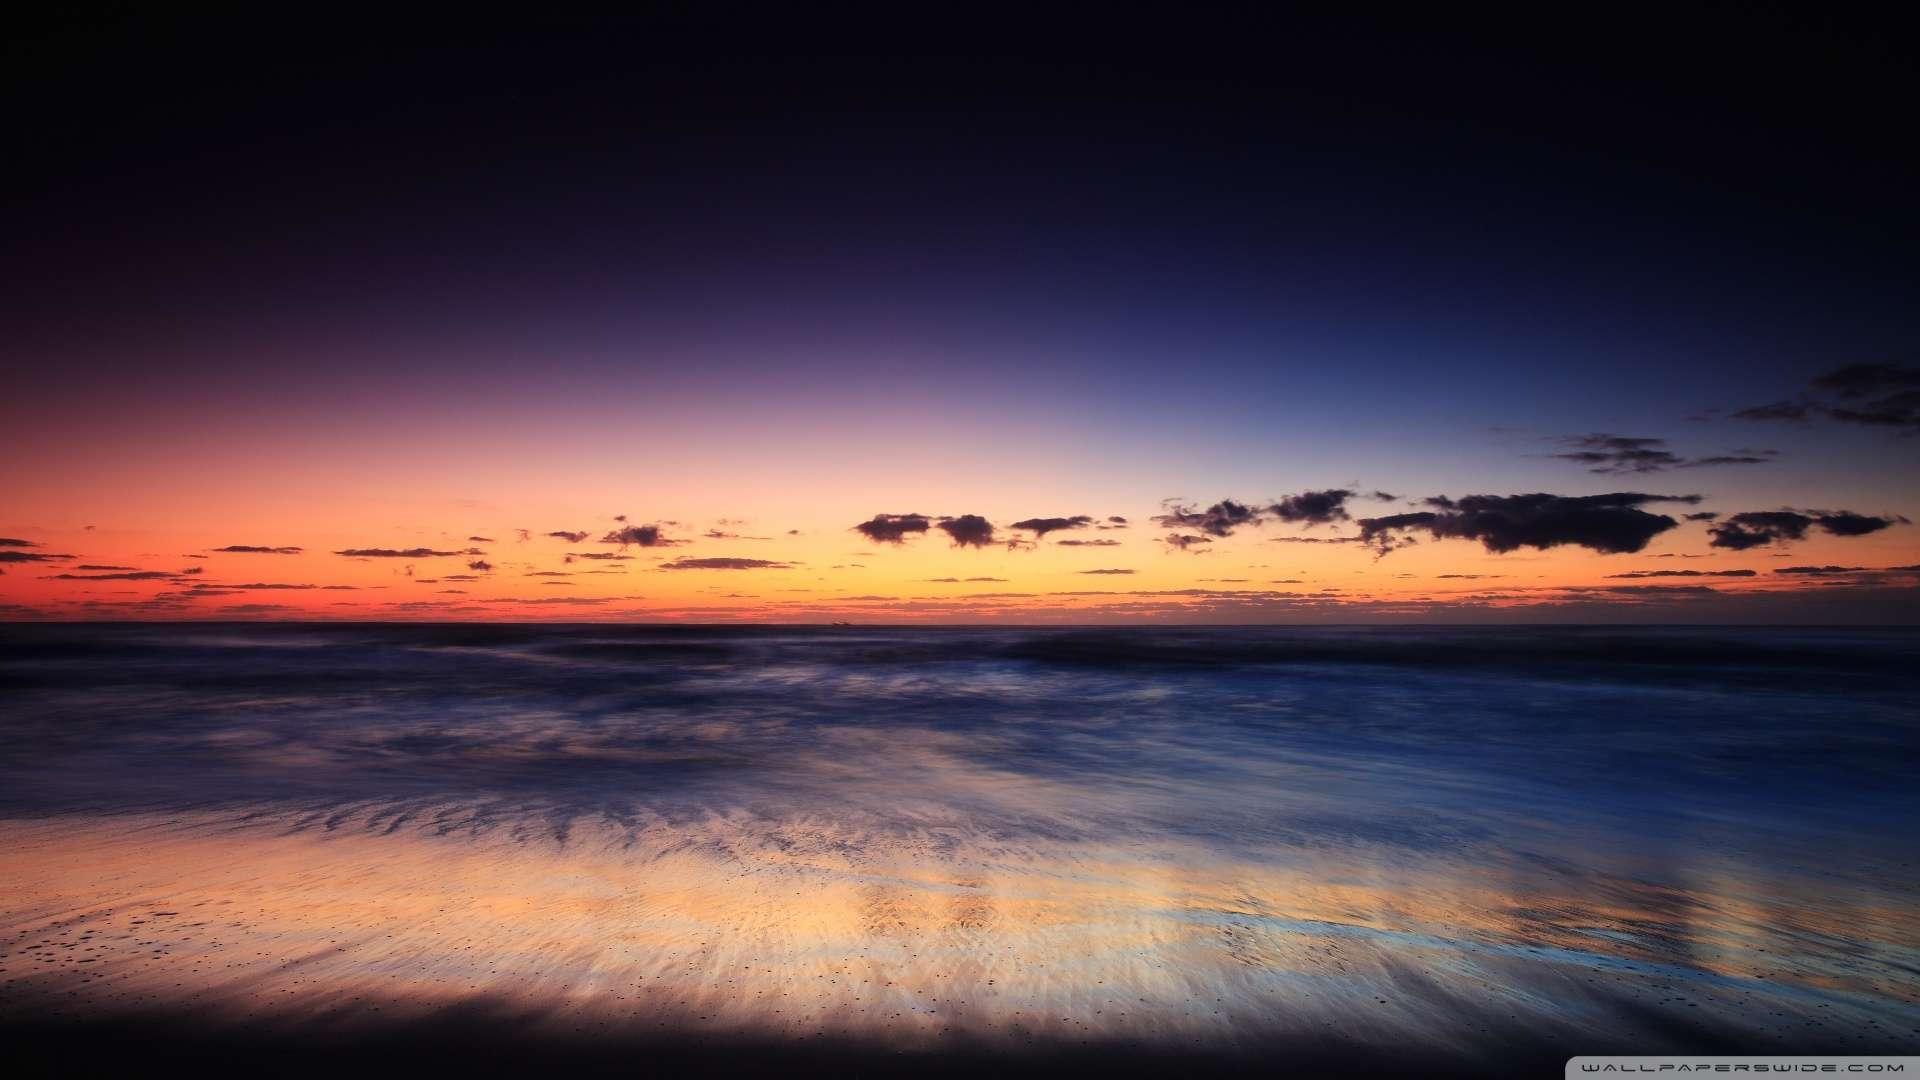 Wallpaper Ocean Beach Wallpaper 1080p HD Upload at February 2 2014 1920x1080